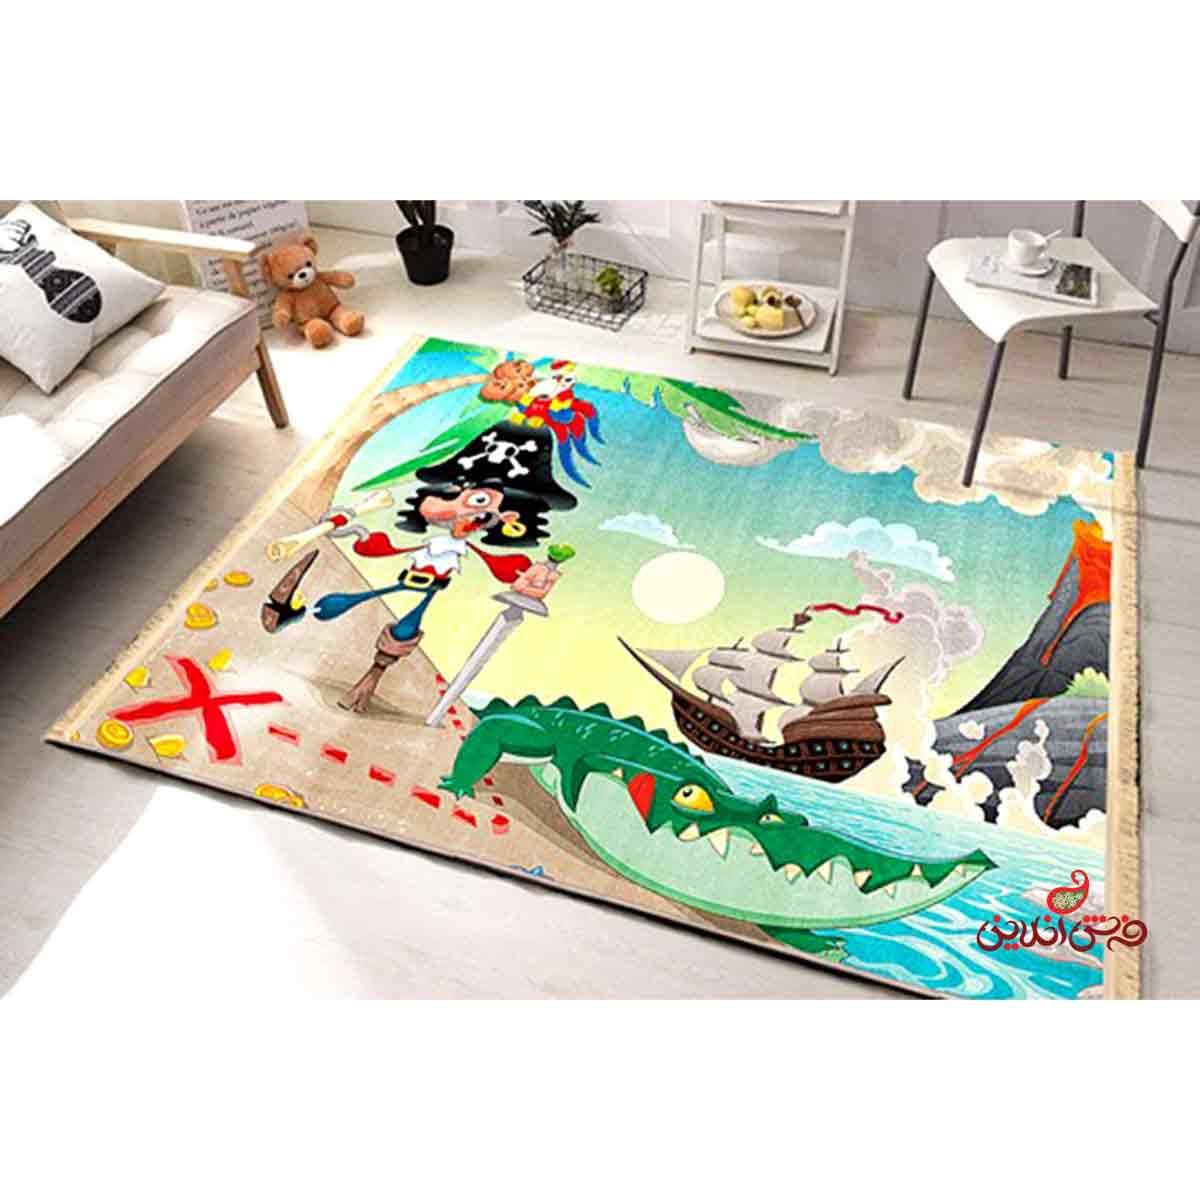 فرش ماشینی کودک کلاریس طرح دزد دریایی کد 100224